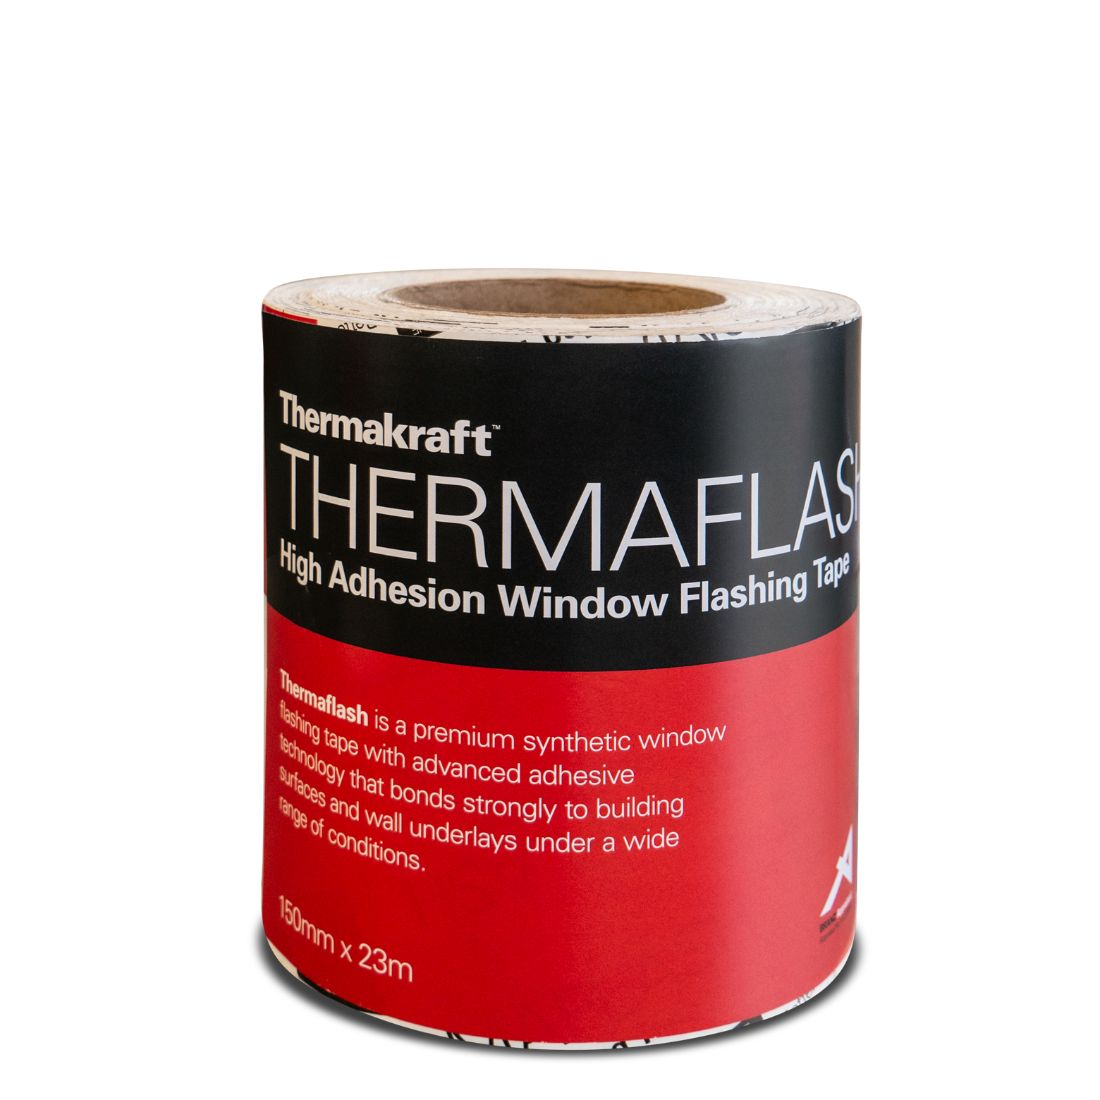 Thermaflash Window Flashing Tape 150mm x 23m